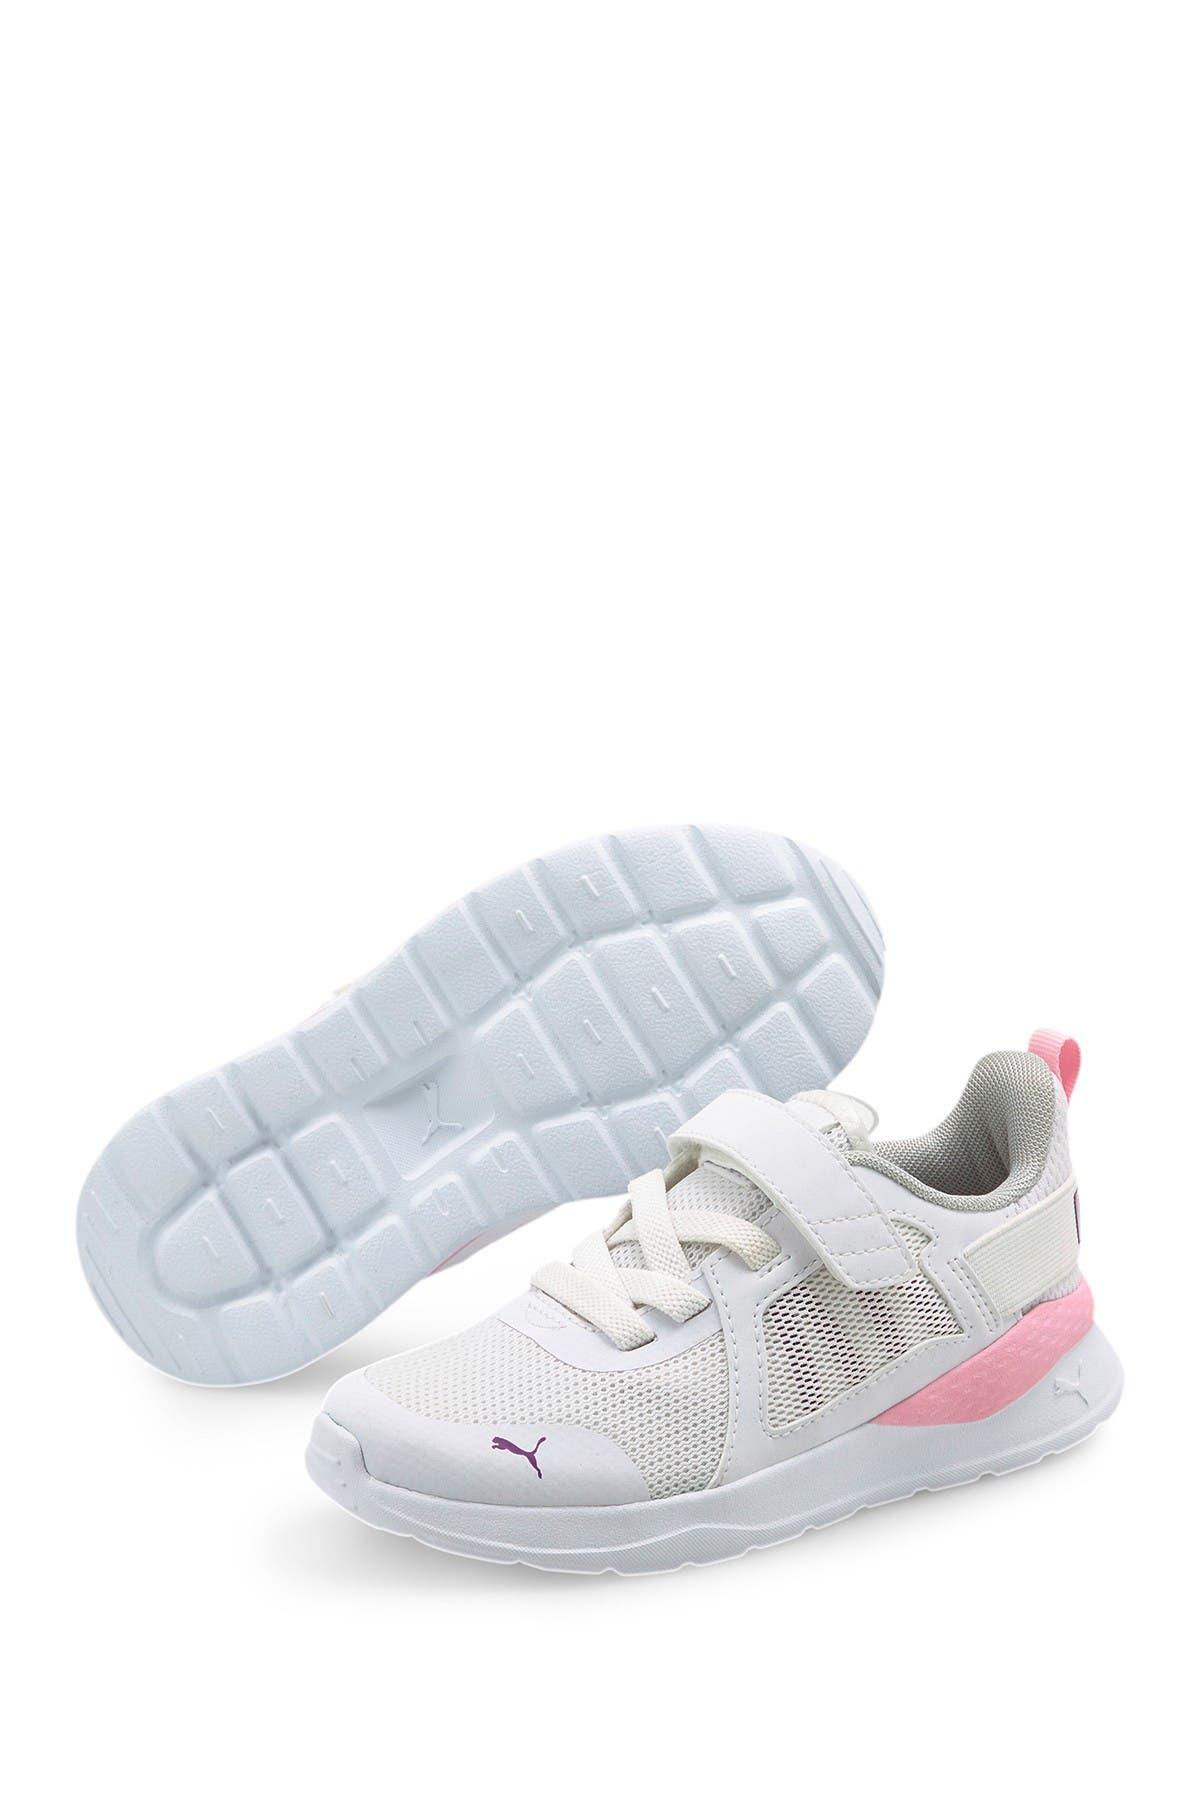 Image of PUMA Anzarun Sneaker